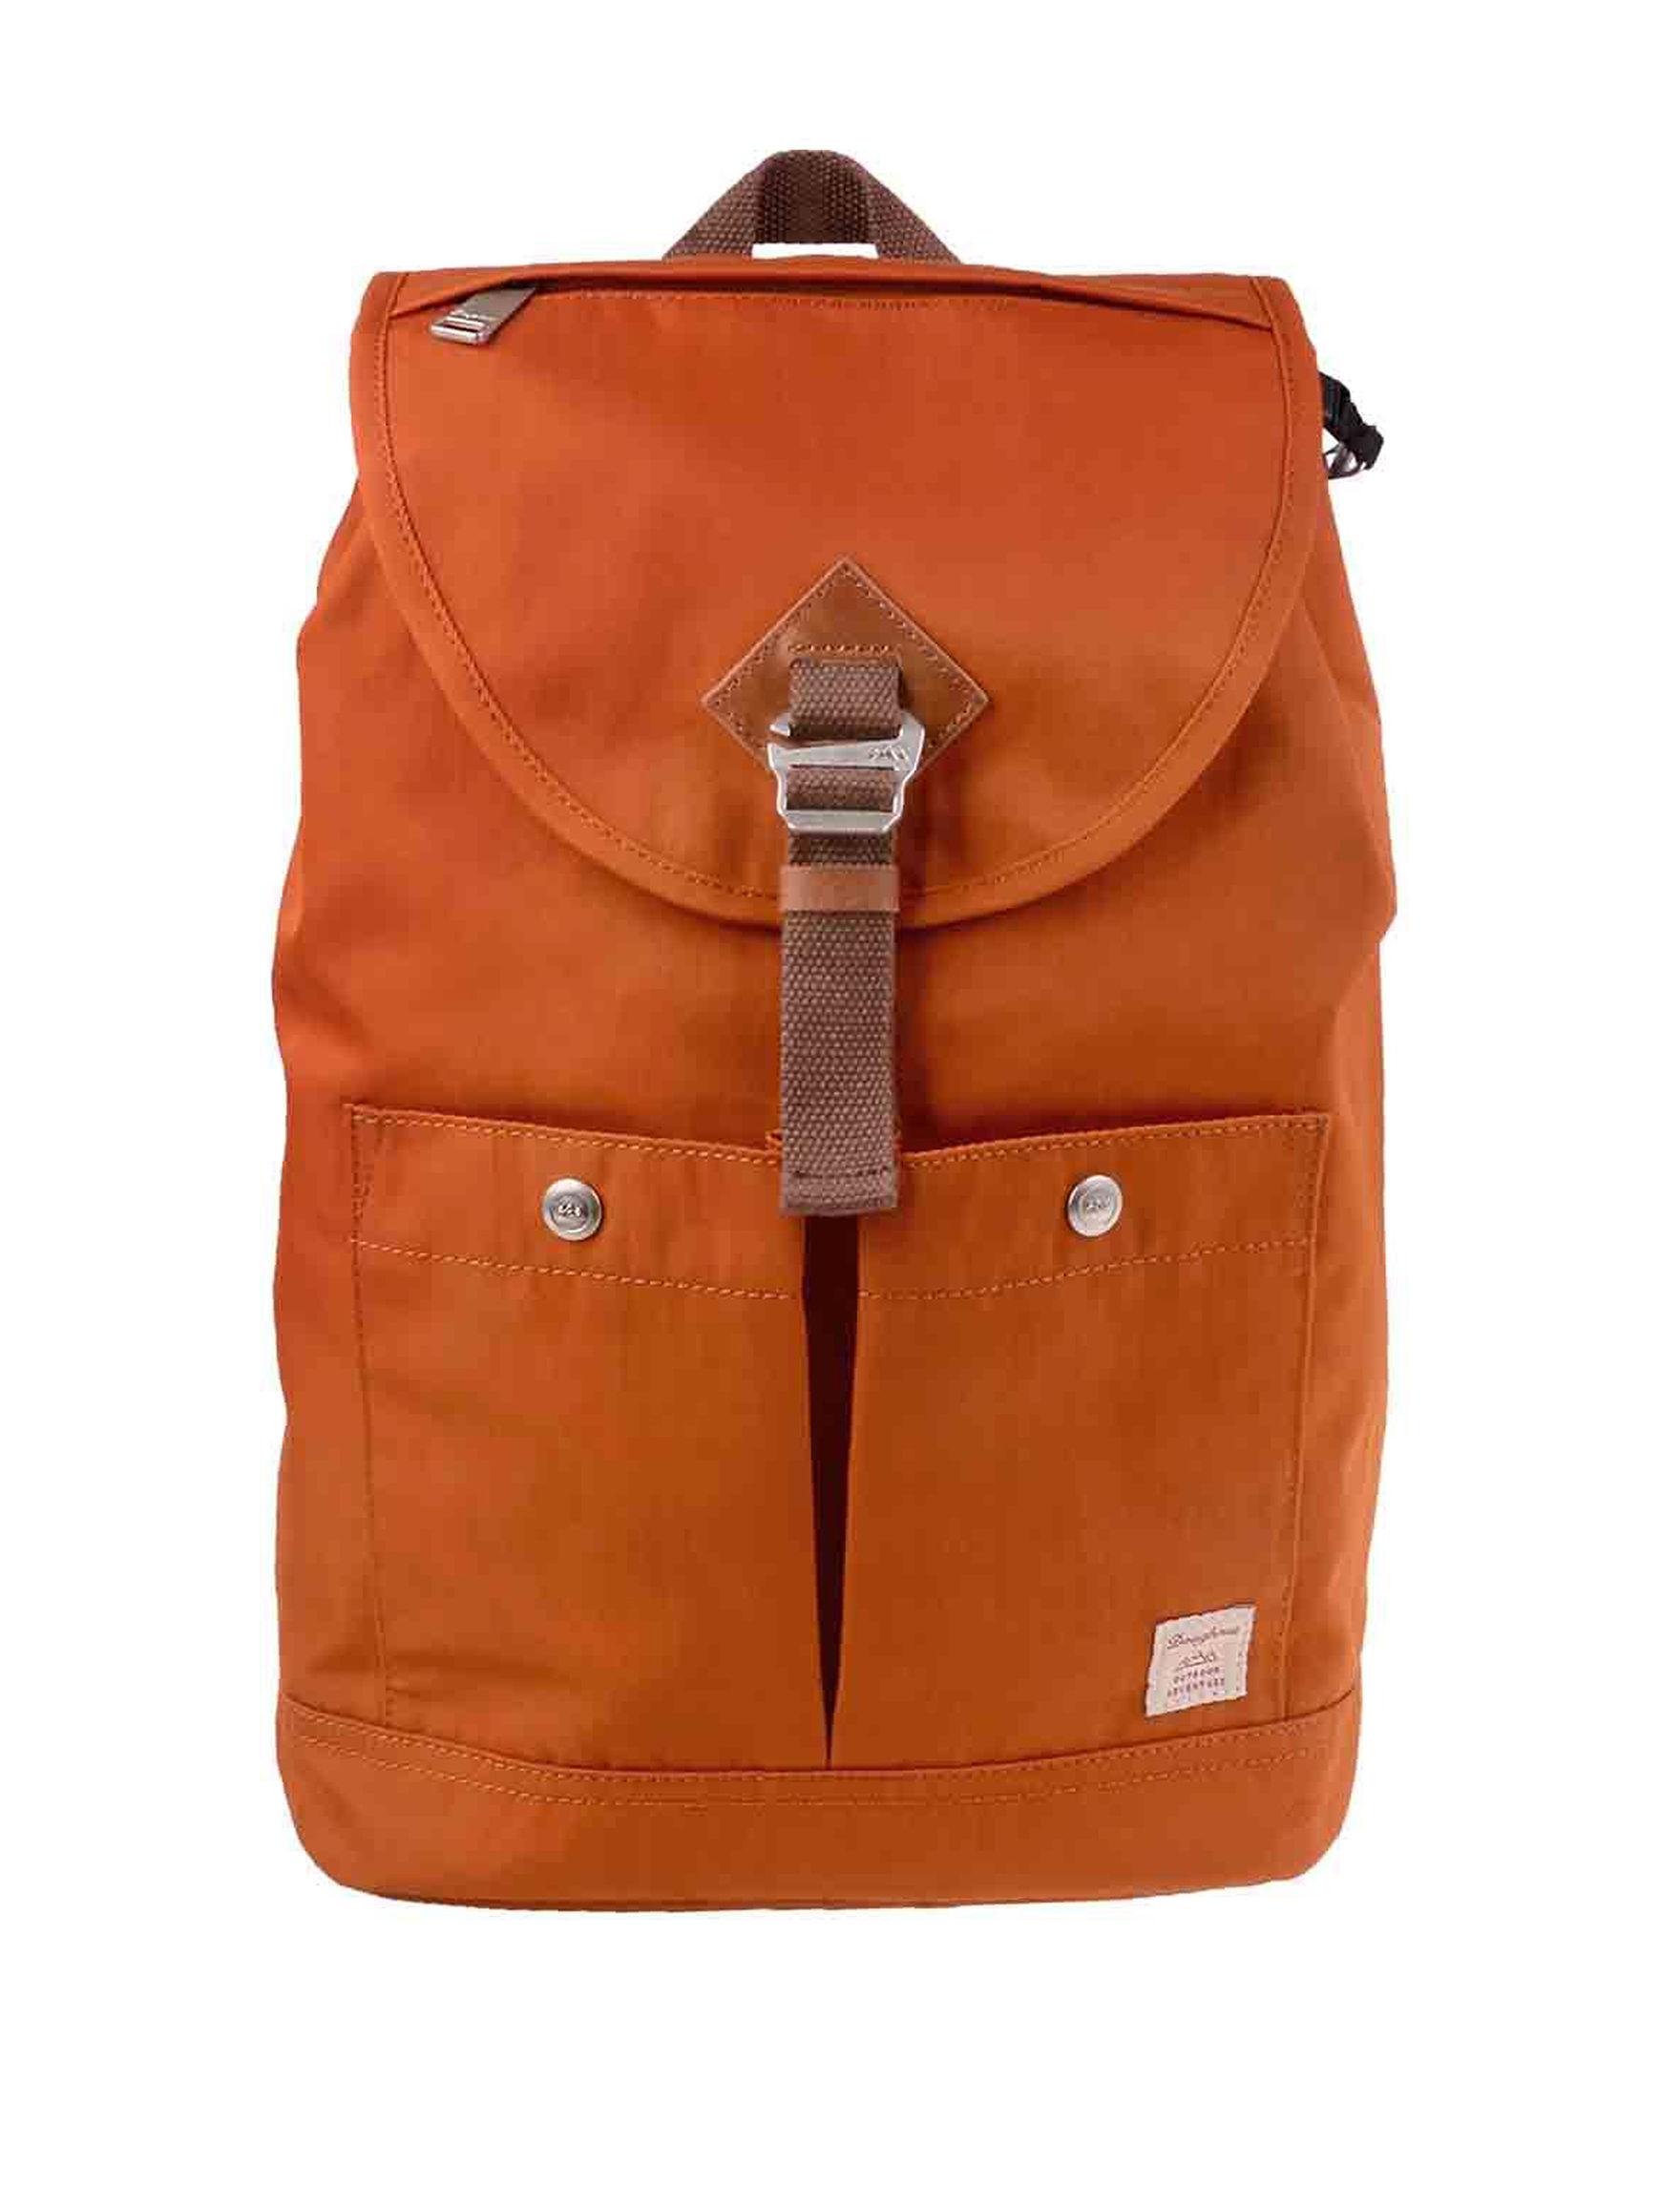 Doughnut Outdoor Gear Rust Bookbags & Backpacks